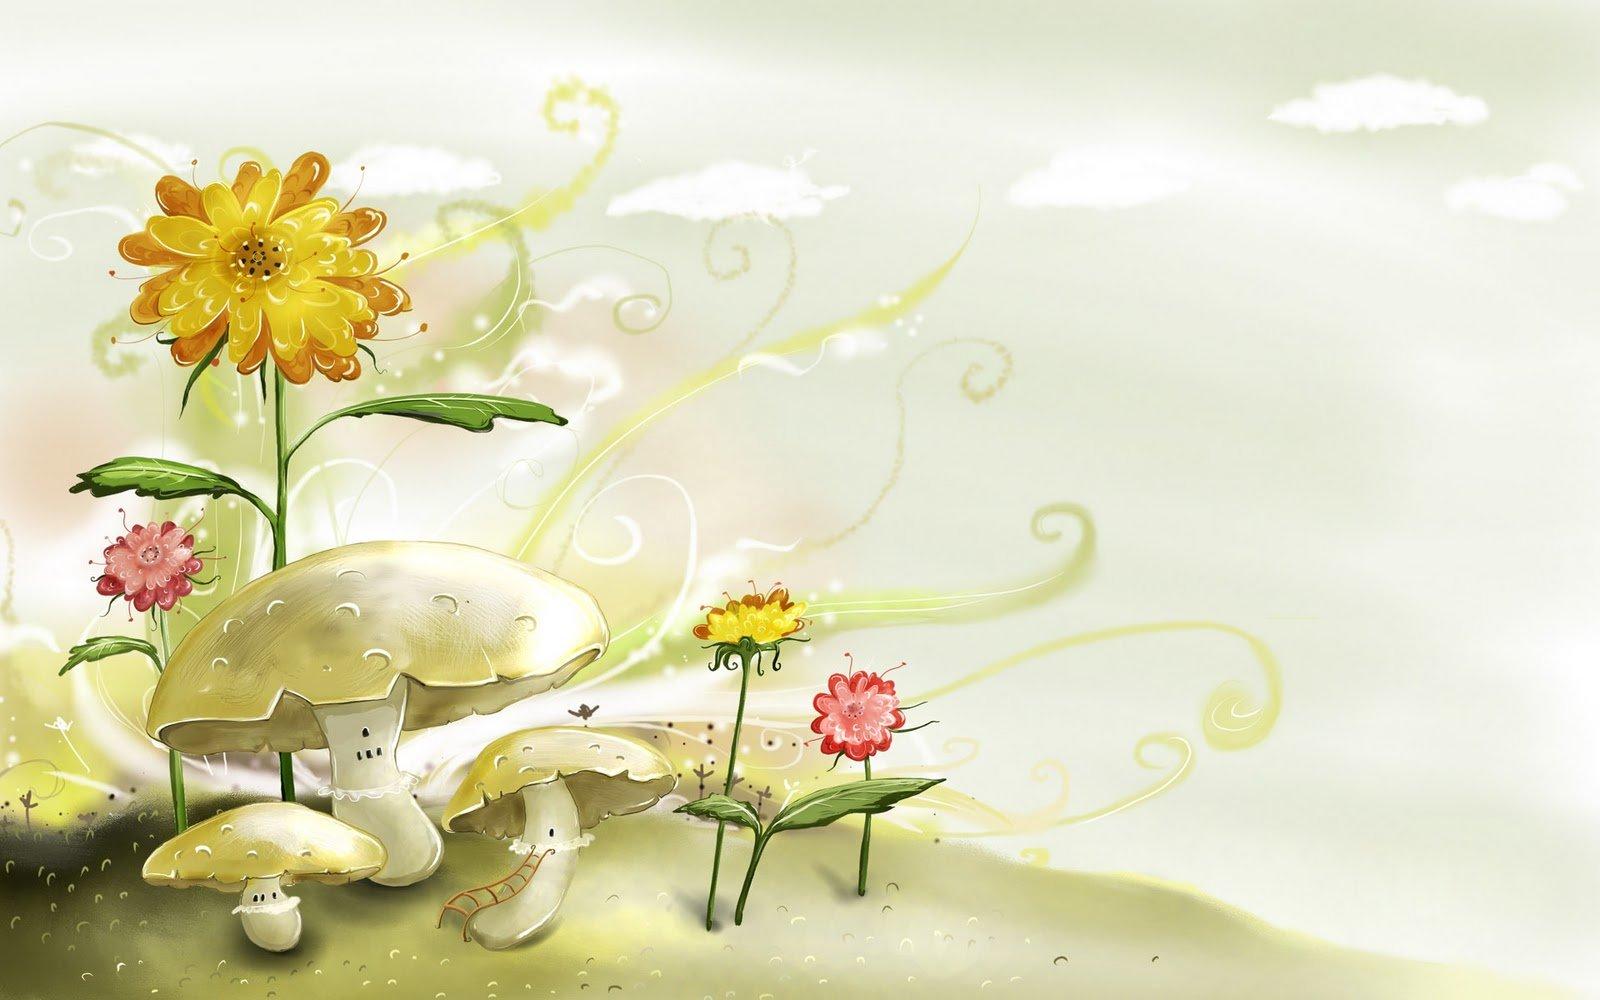 download cute spring wallpaper cute spring wallpaper cute 1600x1000